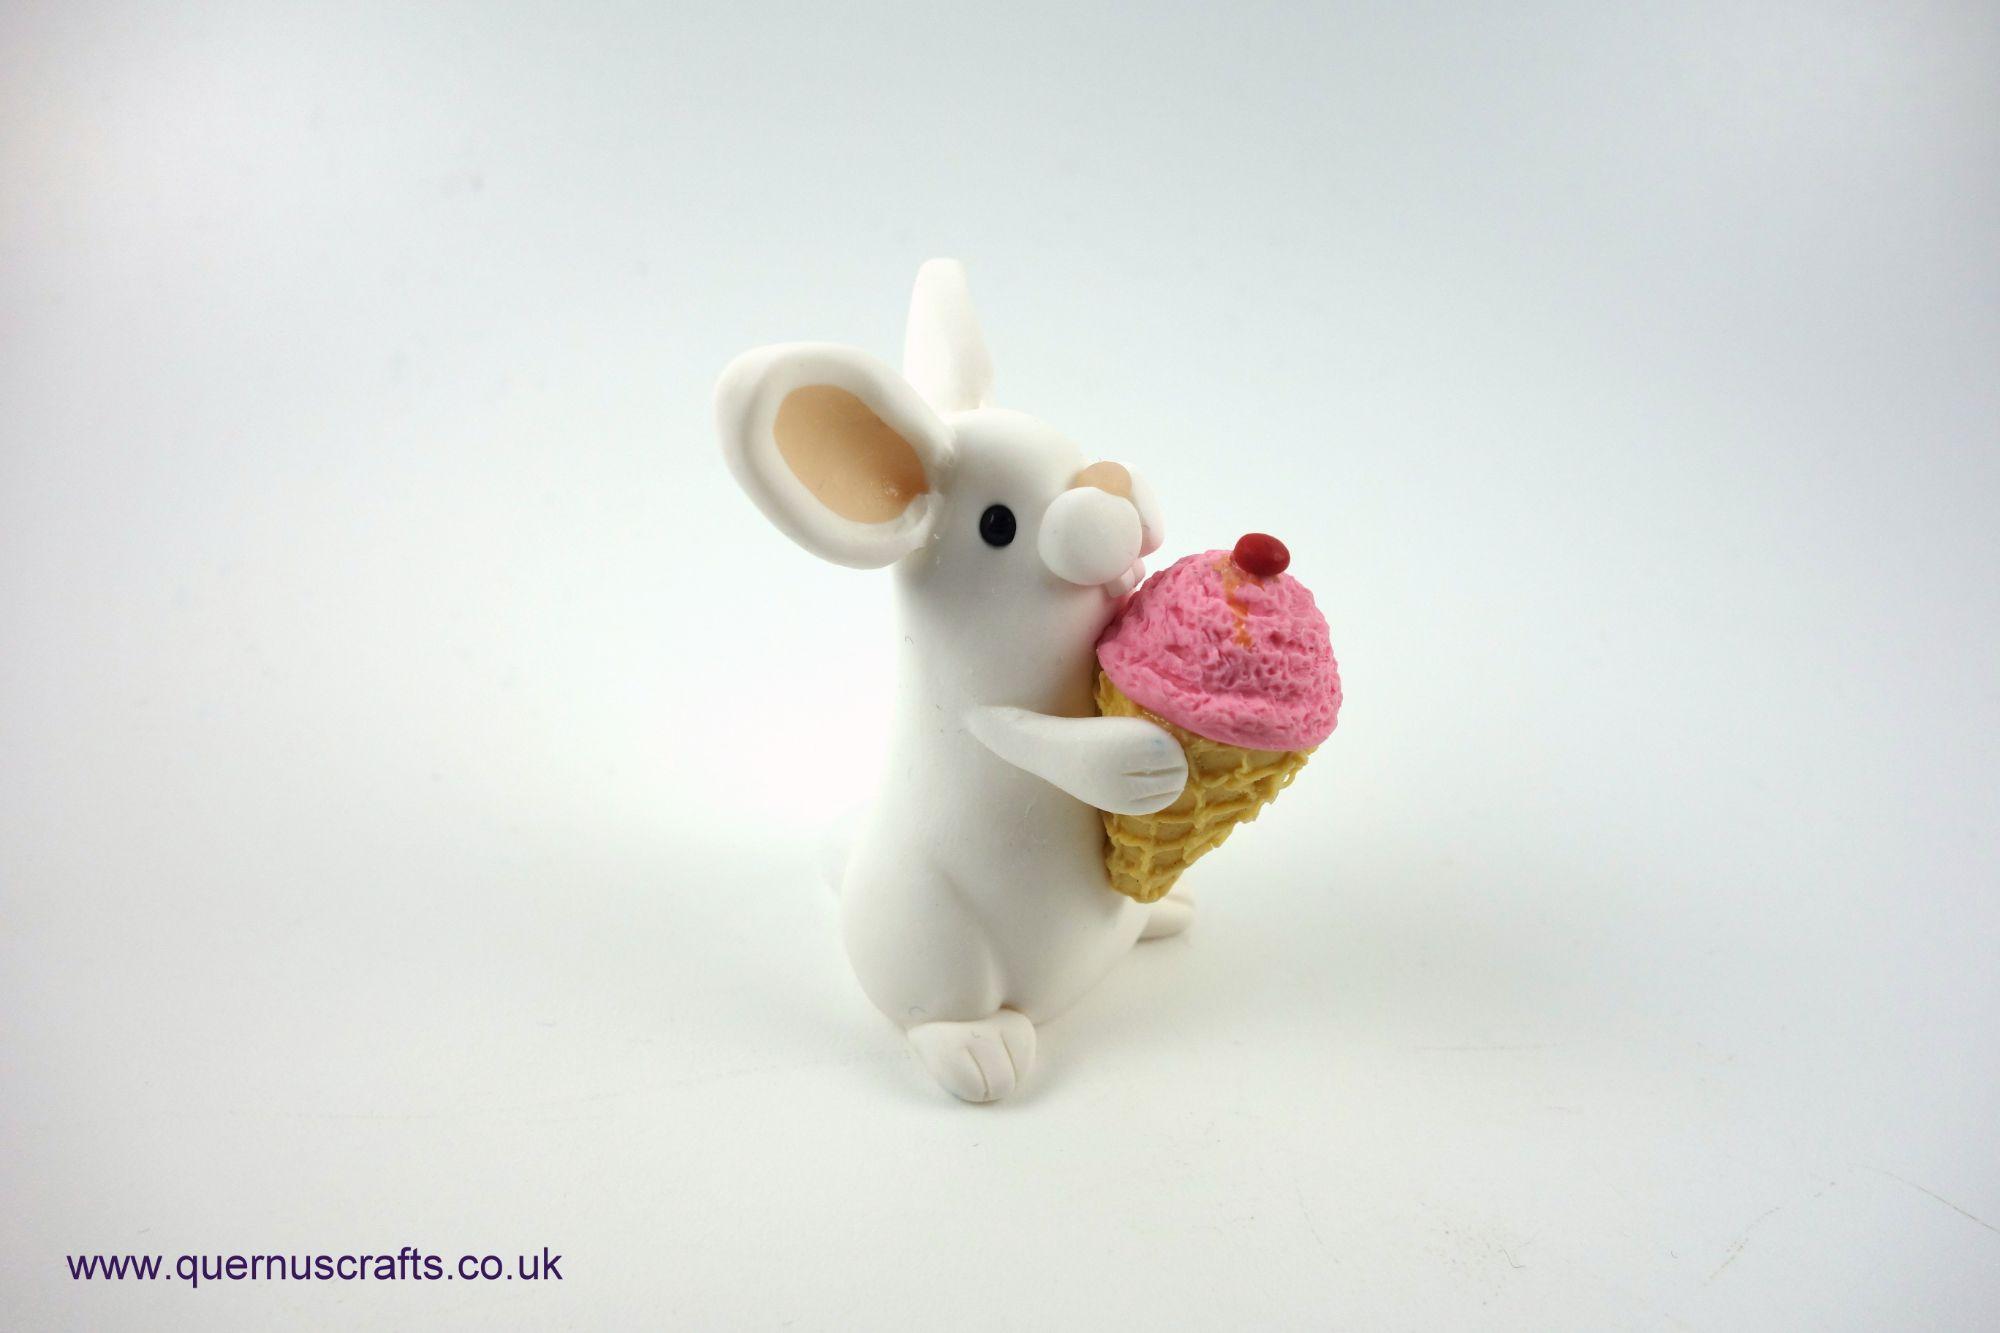 Little Ice Cream Bunny